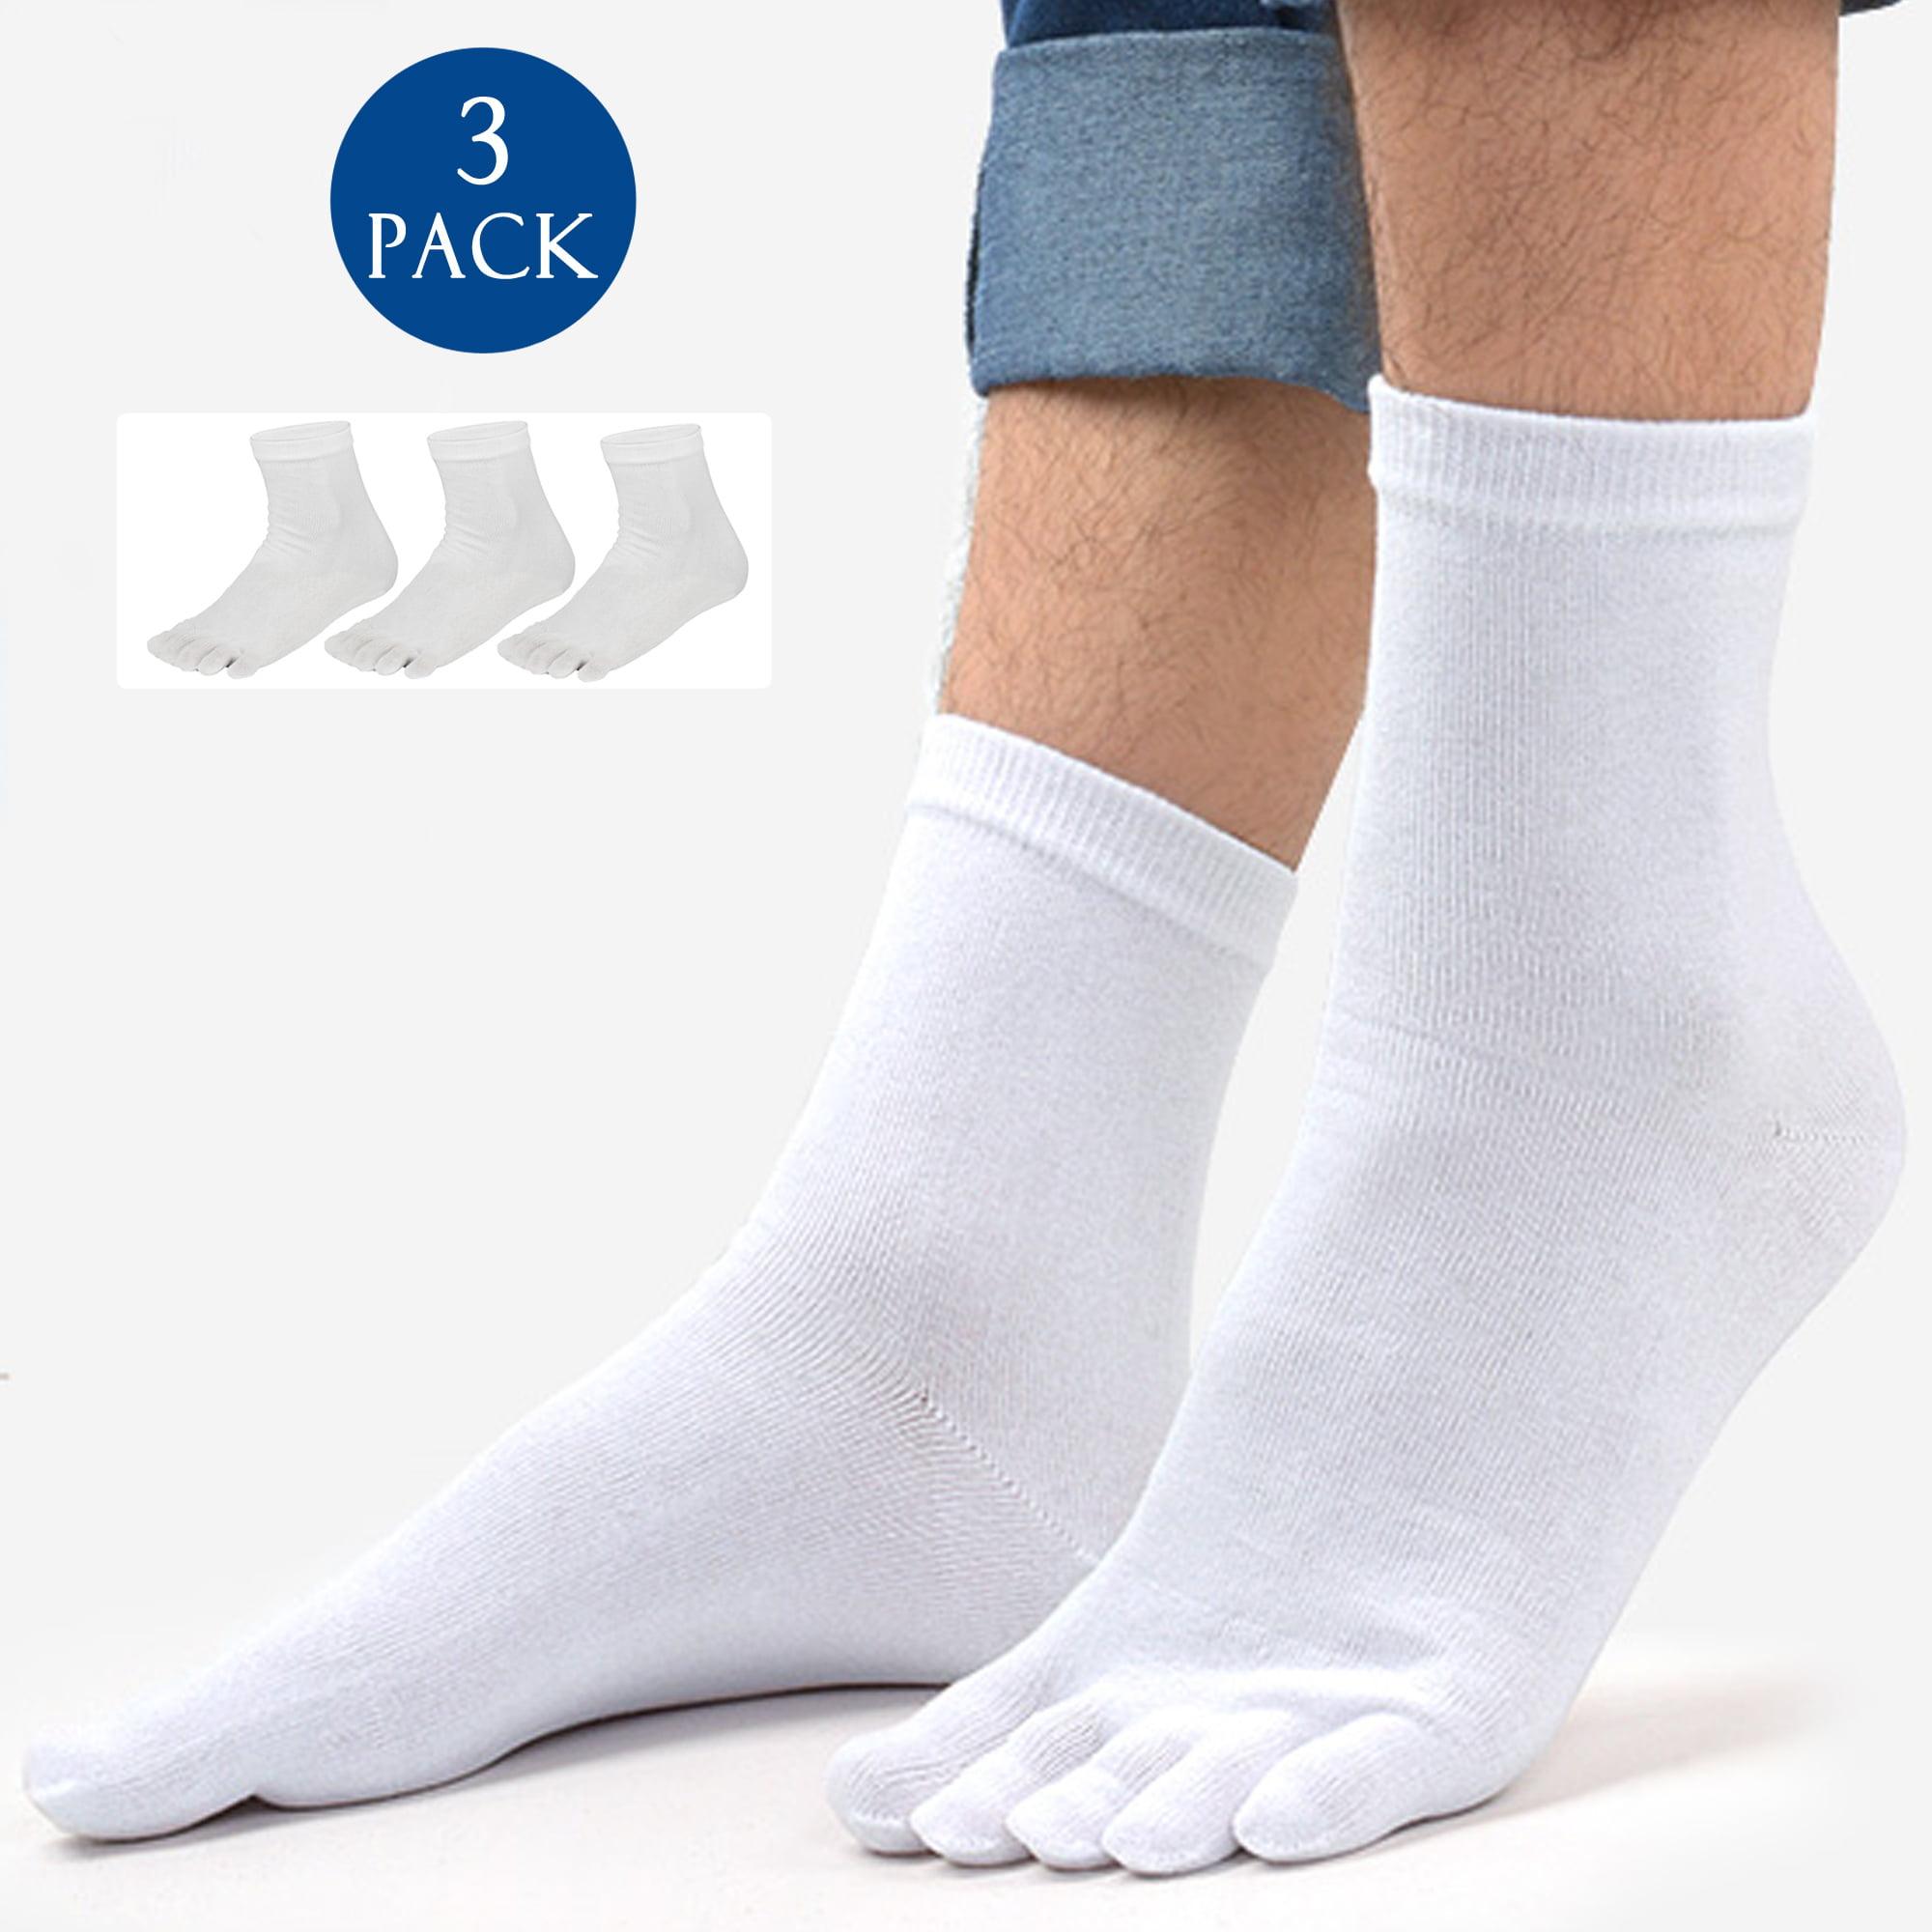 LEGO Socks Black Toes